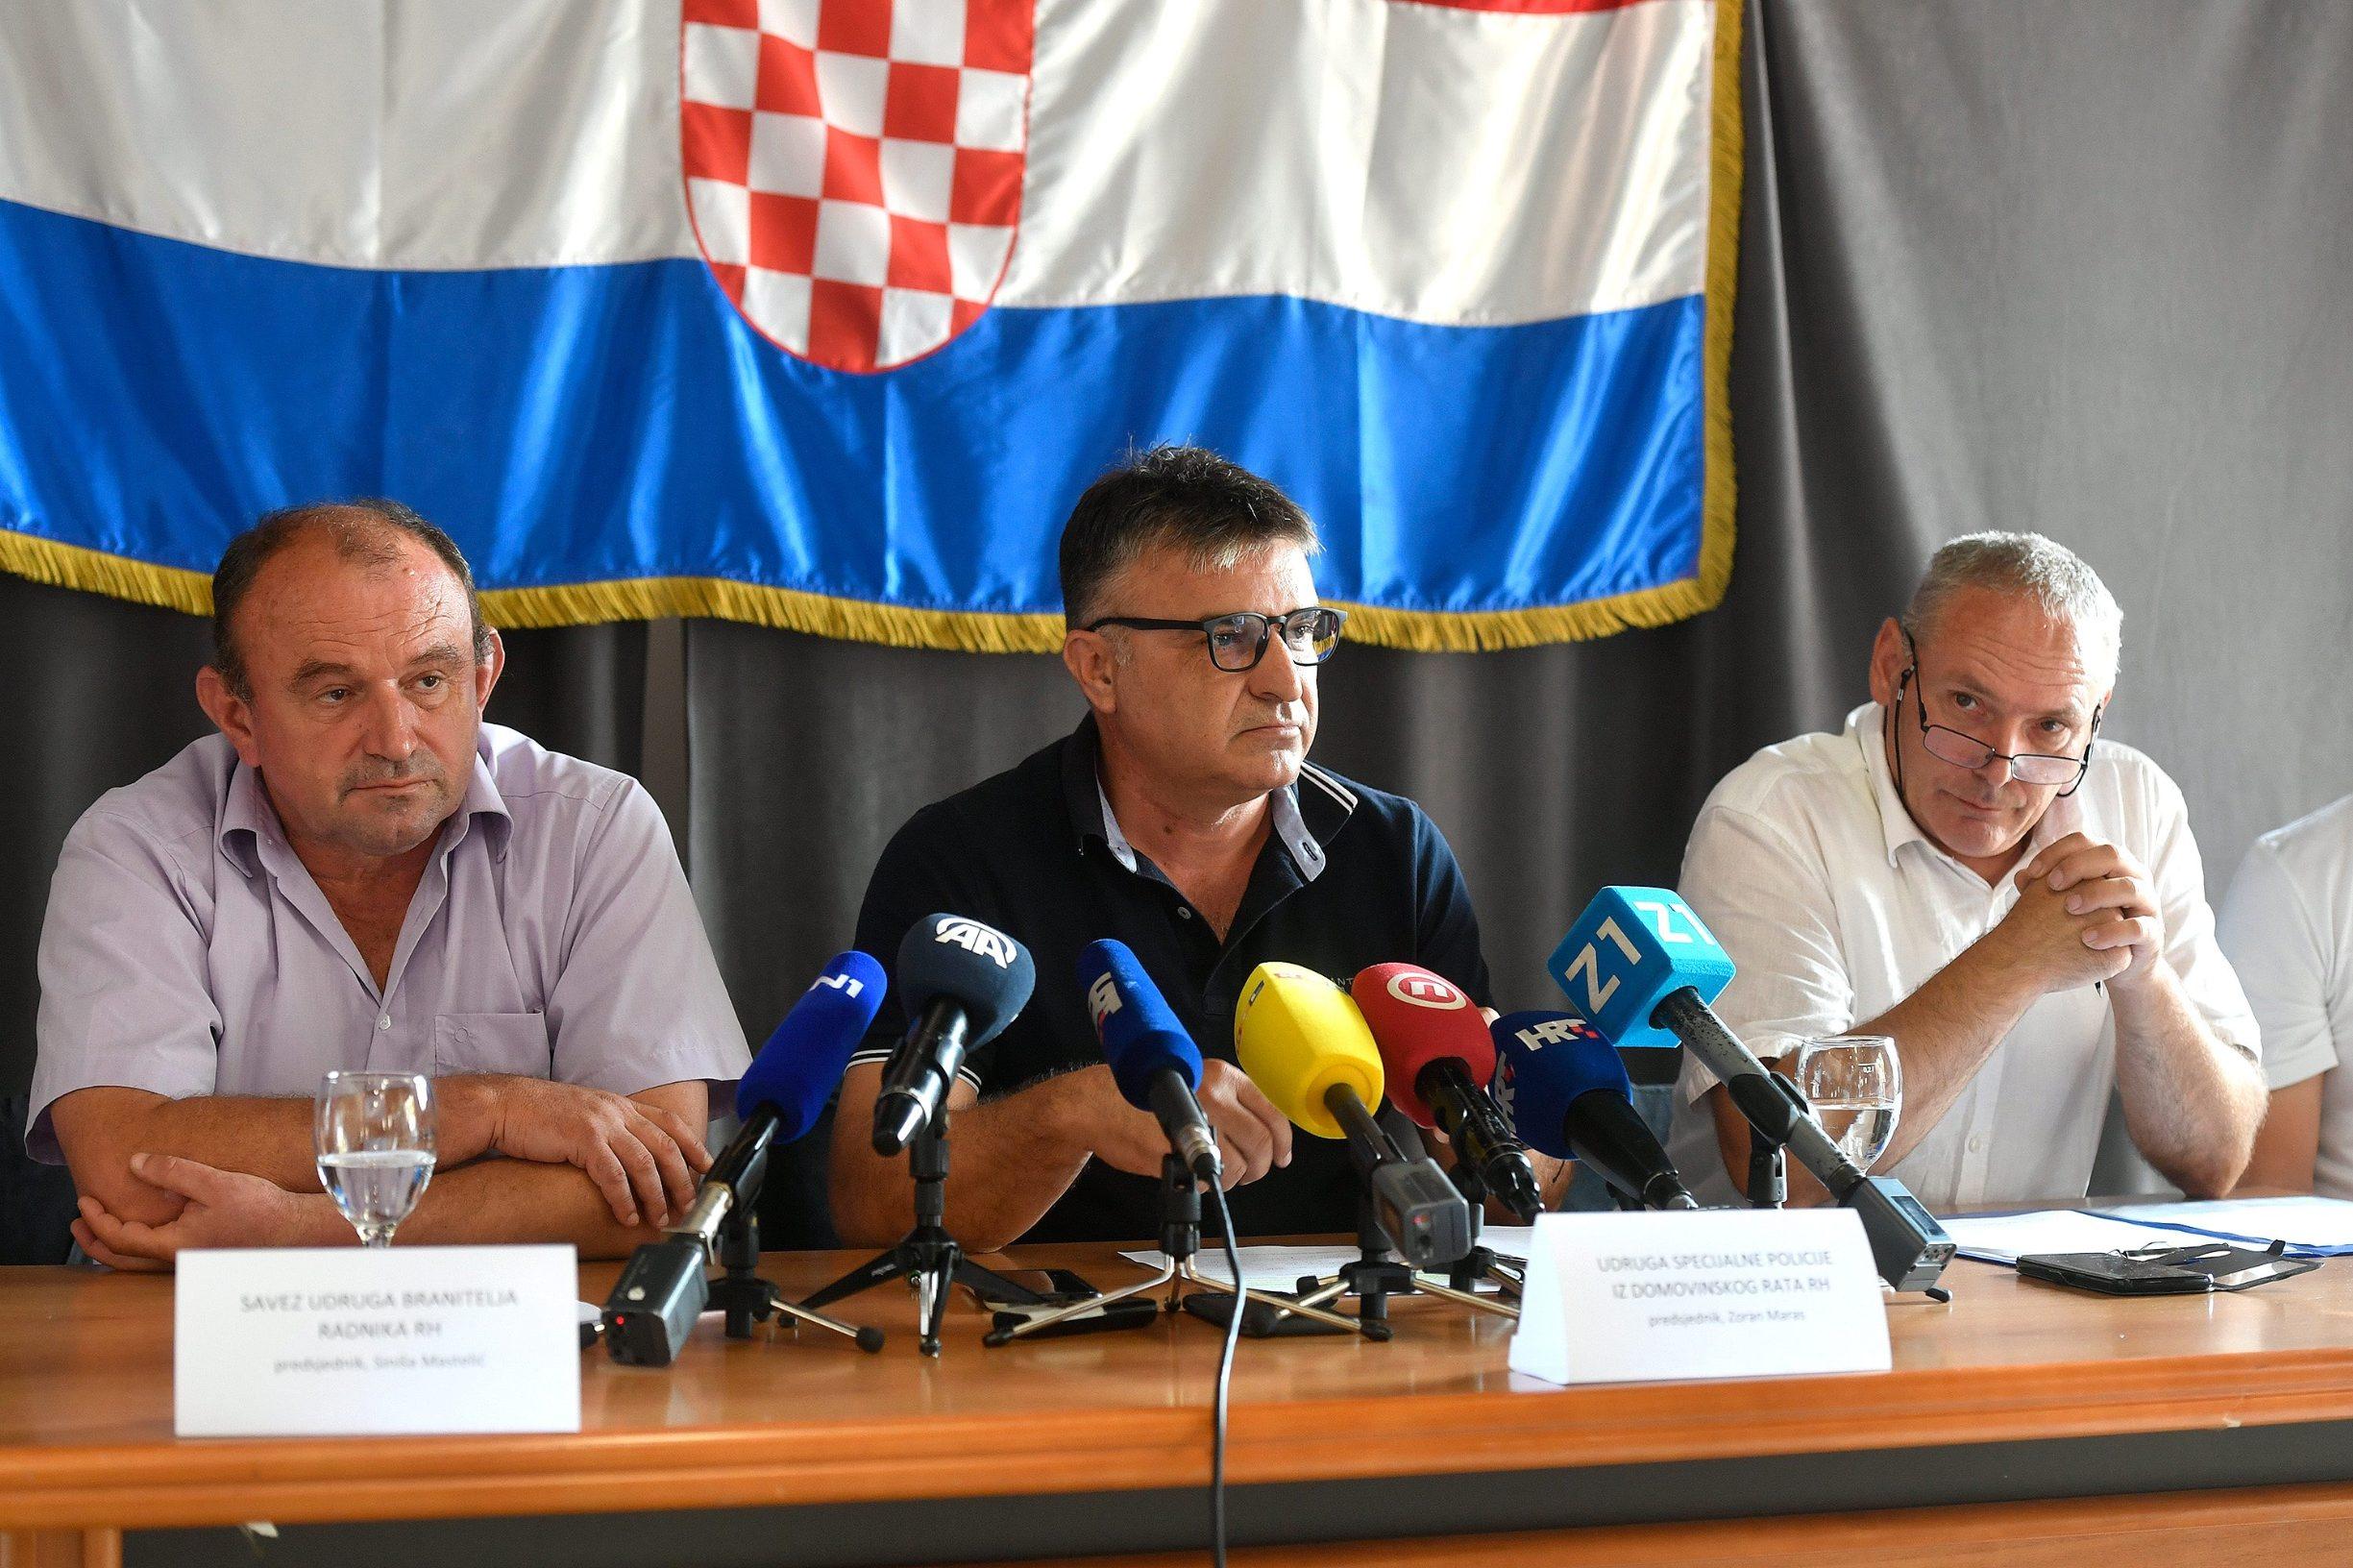 Siniša Mastelić, Zoran Maras i Krešimir Maretić